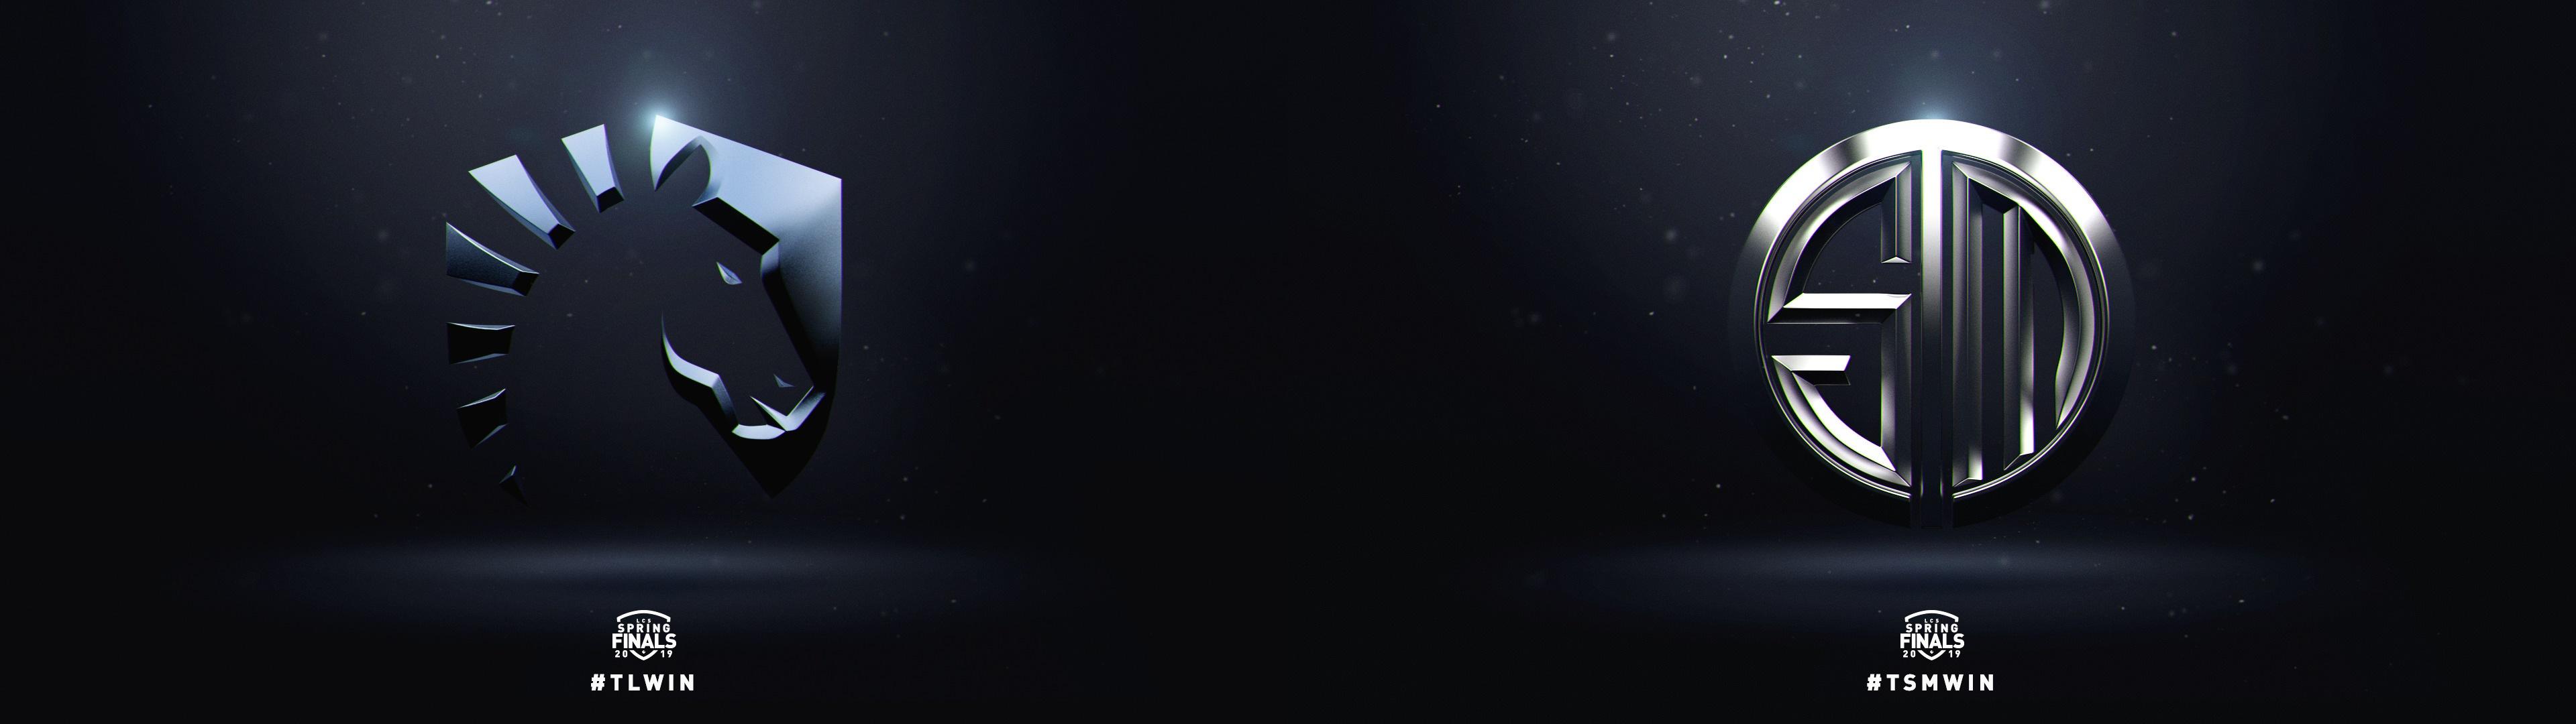 Team Liquid will face TSM in LCS 2019 grand finals